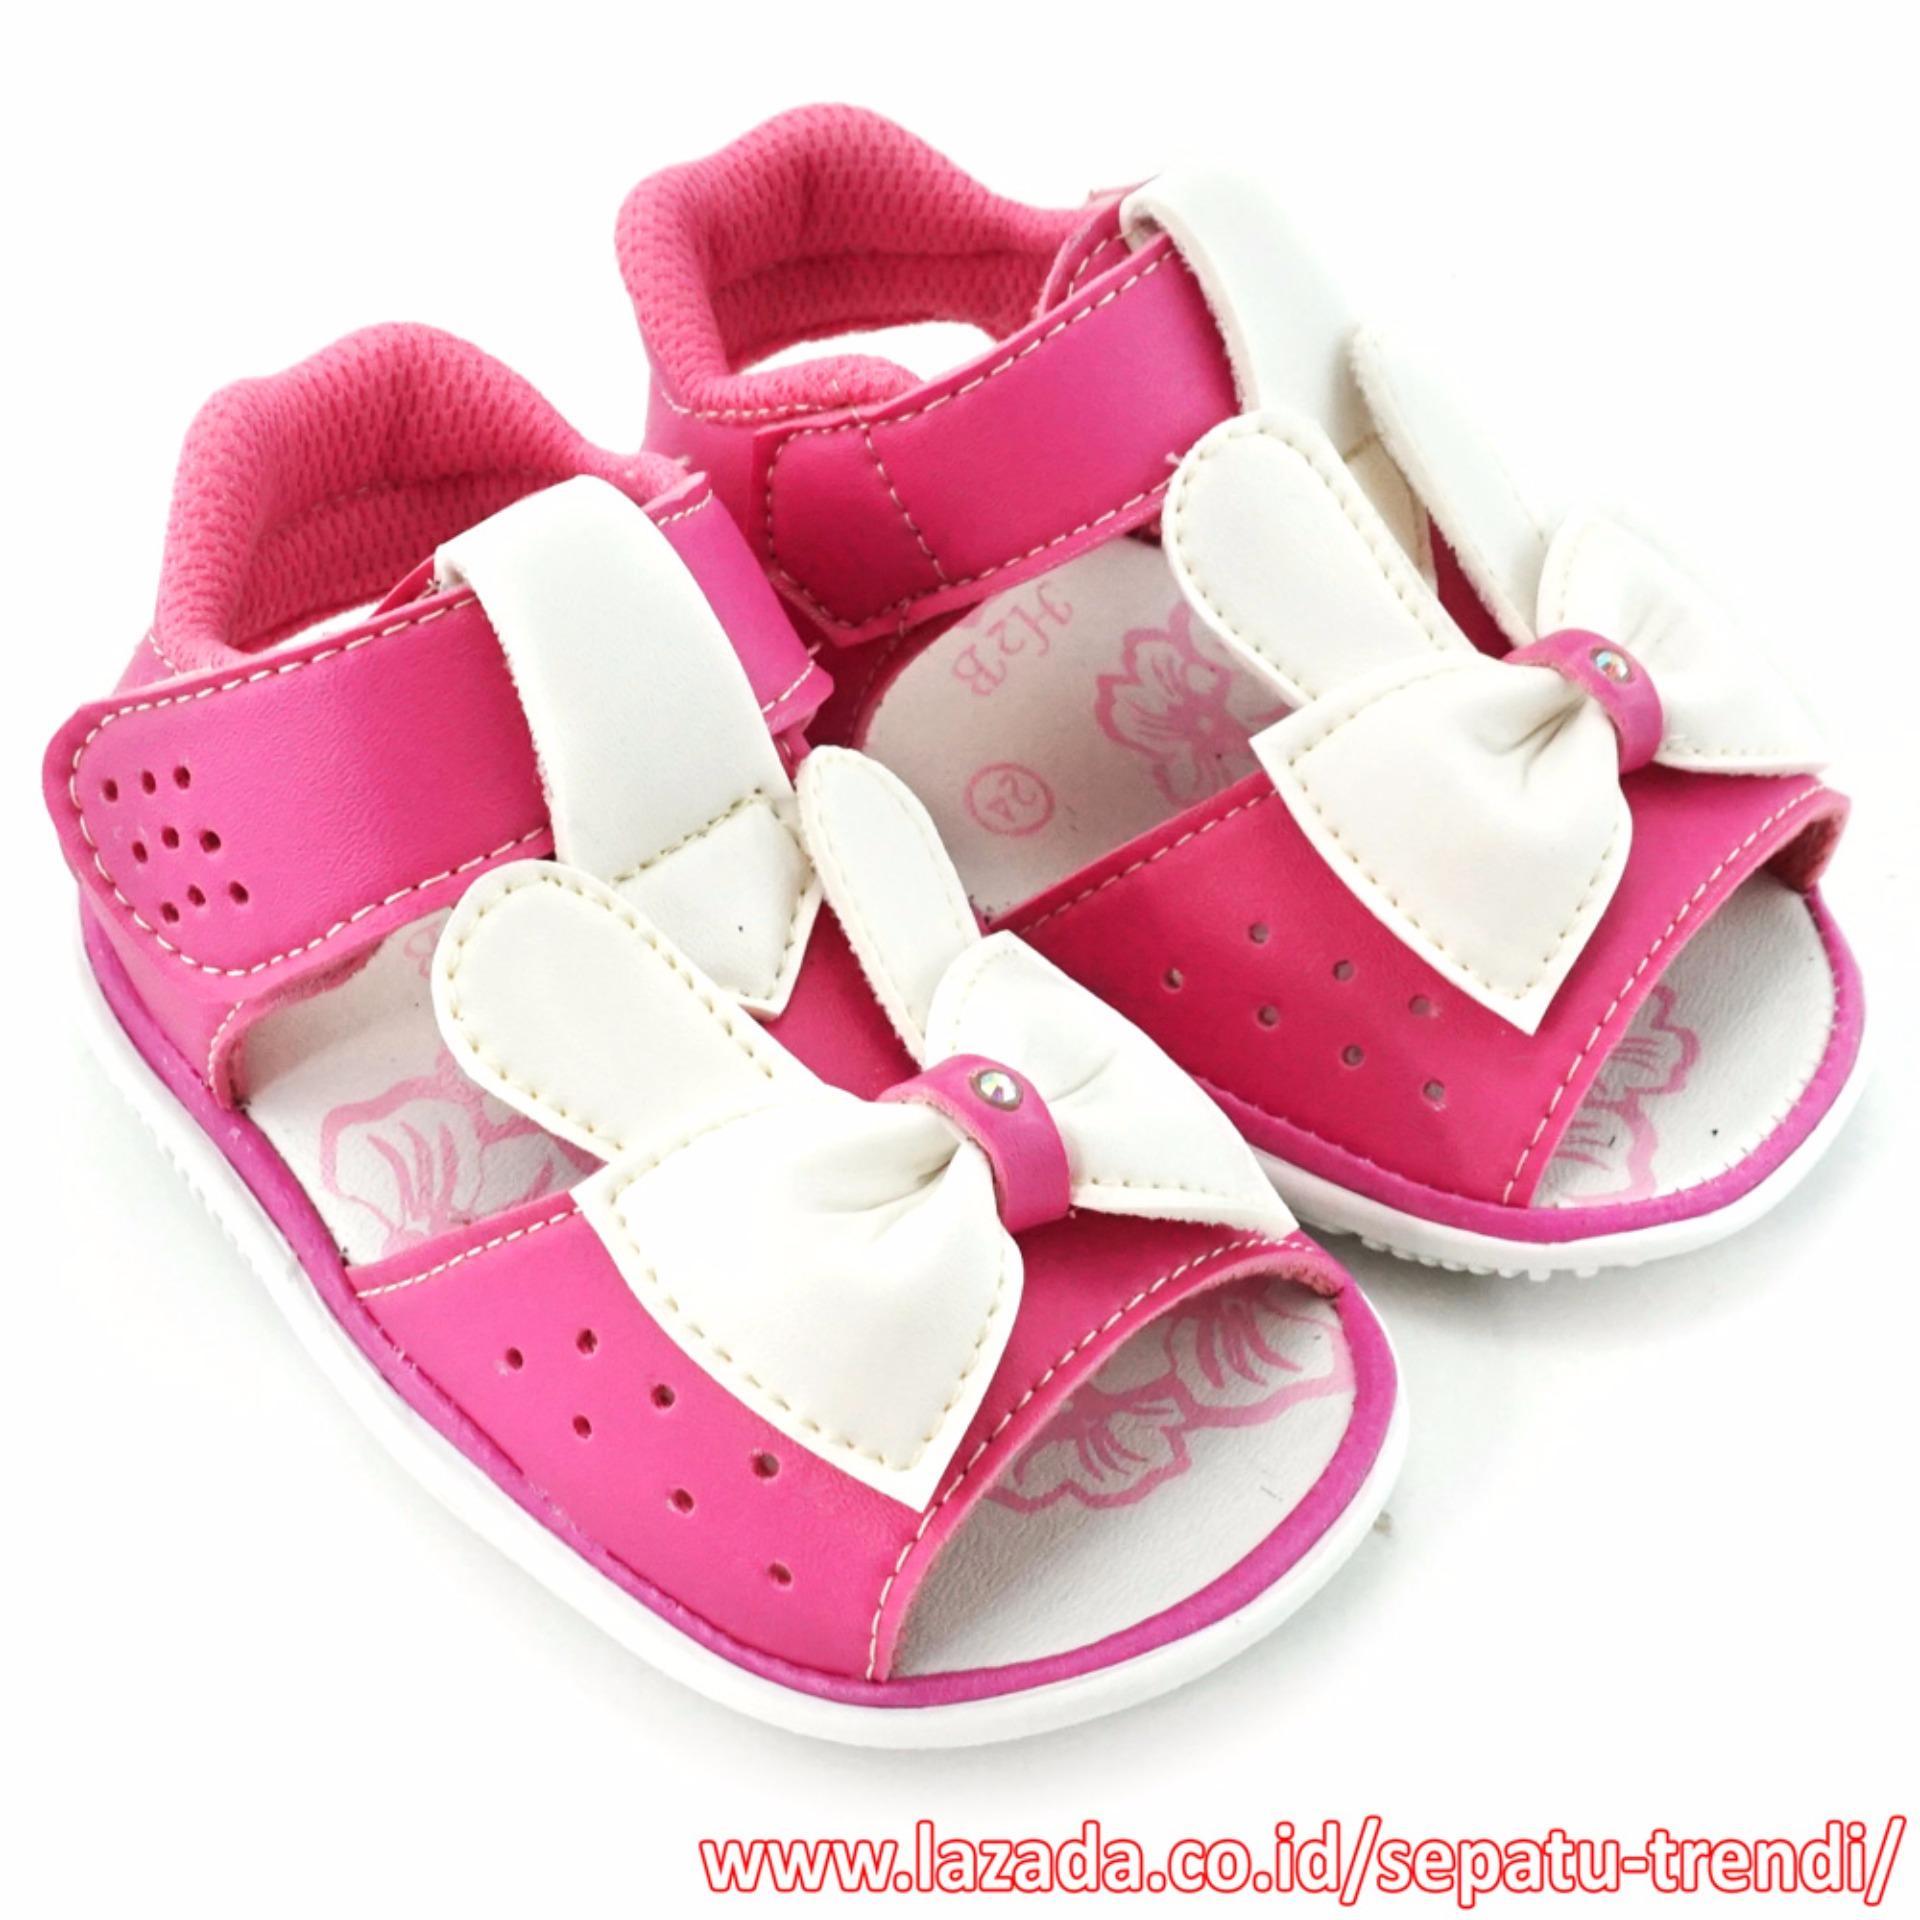 TrendiShoes Sepatu Sandal Bunyi Anak Walker PBDNR4 - Fuchsia